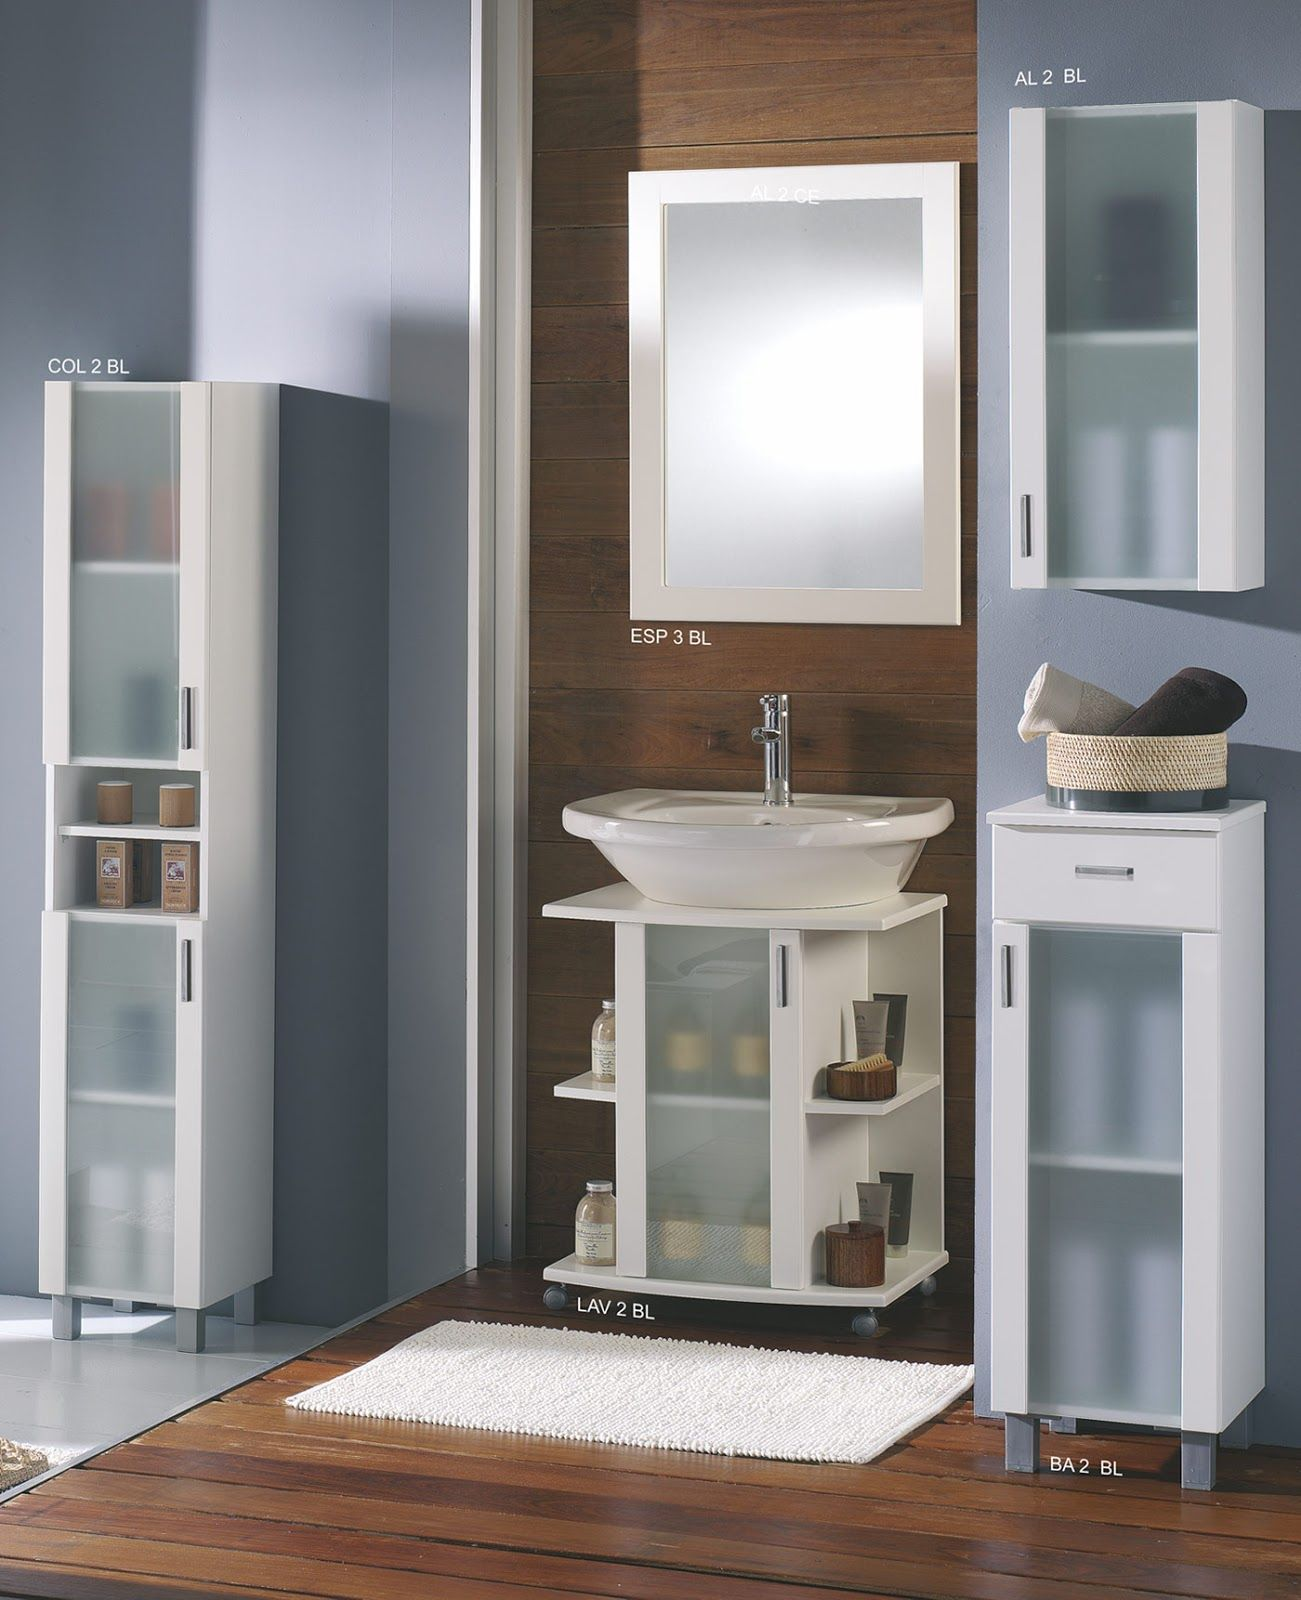 mueble baño barato bajo lavabo blanco oferta | muebles de baño de